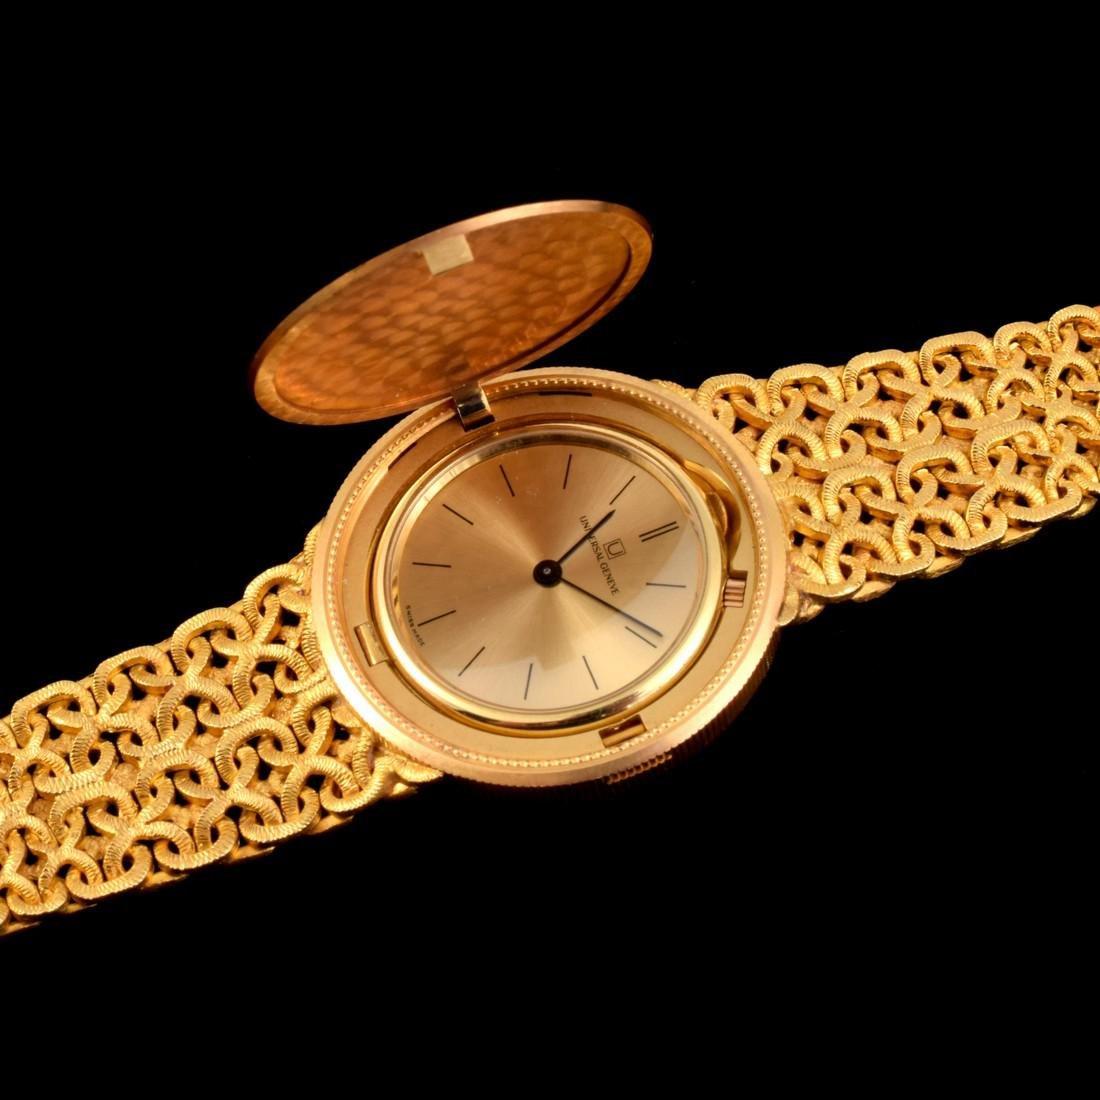 18K Yellow Gold Universal Geneve Vintage Estate Watch